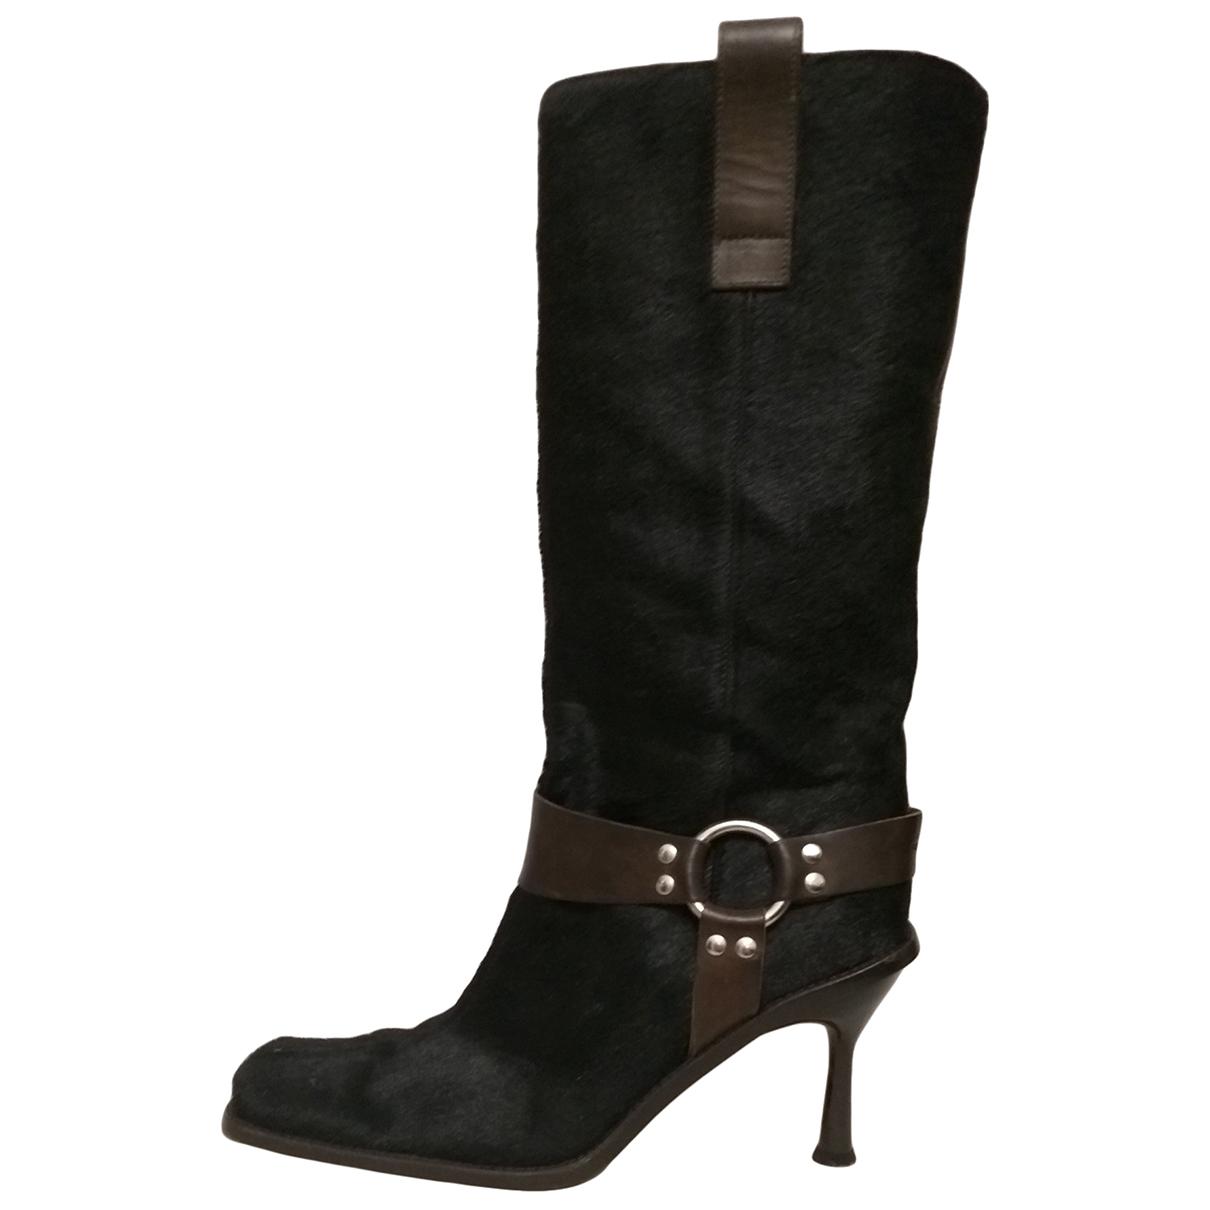 Dolce & Gabbana \N Stiefel in  Schwarz Kalbsleder in Pony-Optik